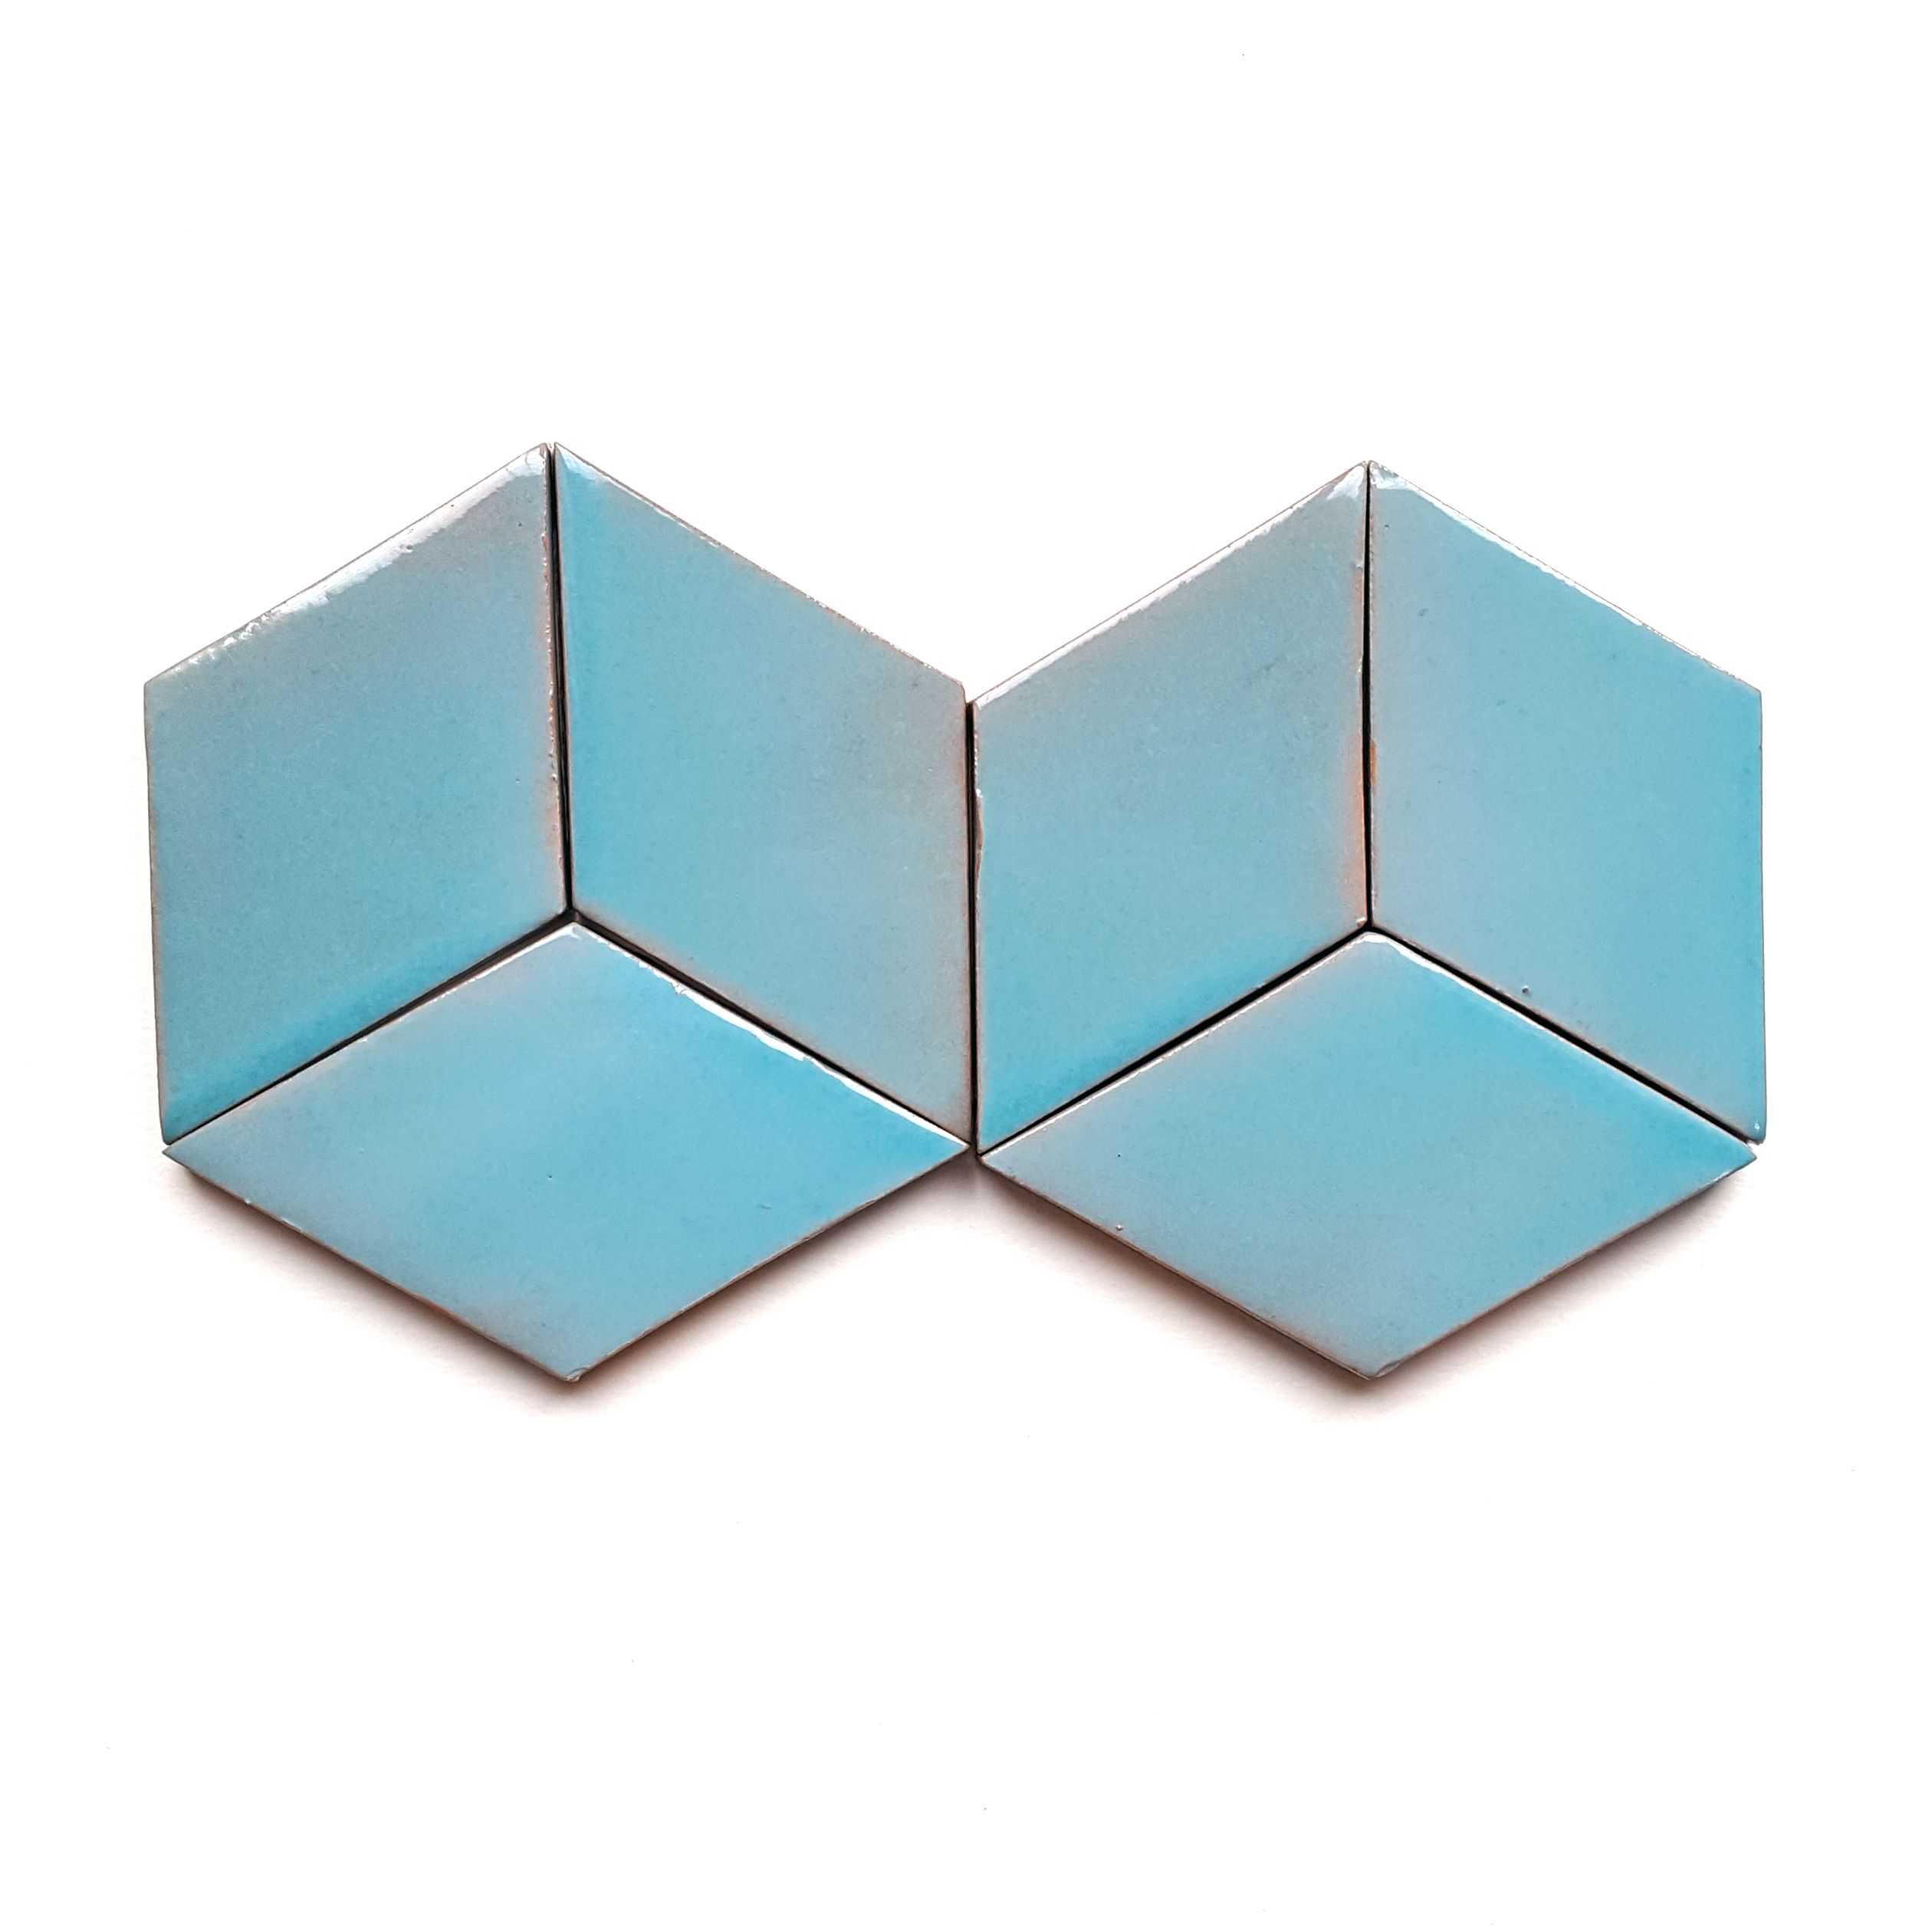 Pin by TILE DESIRE on Diamond Cube Tiles | Pinterest | Cube, Tiles ...